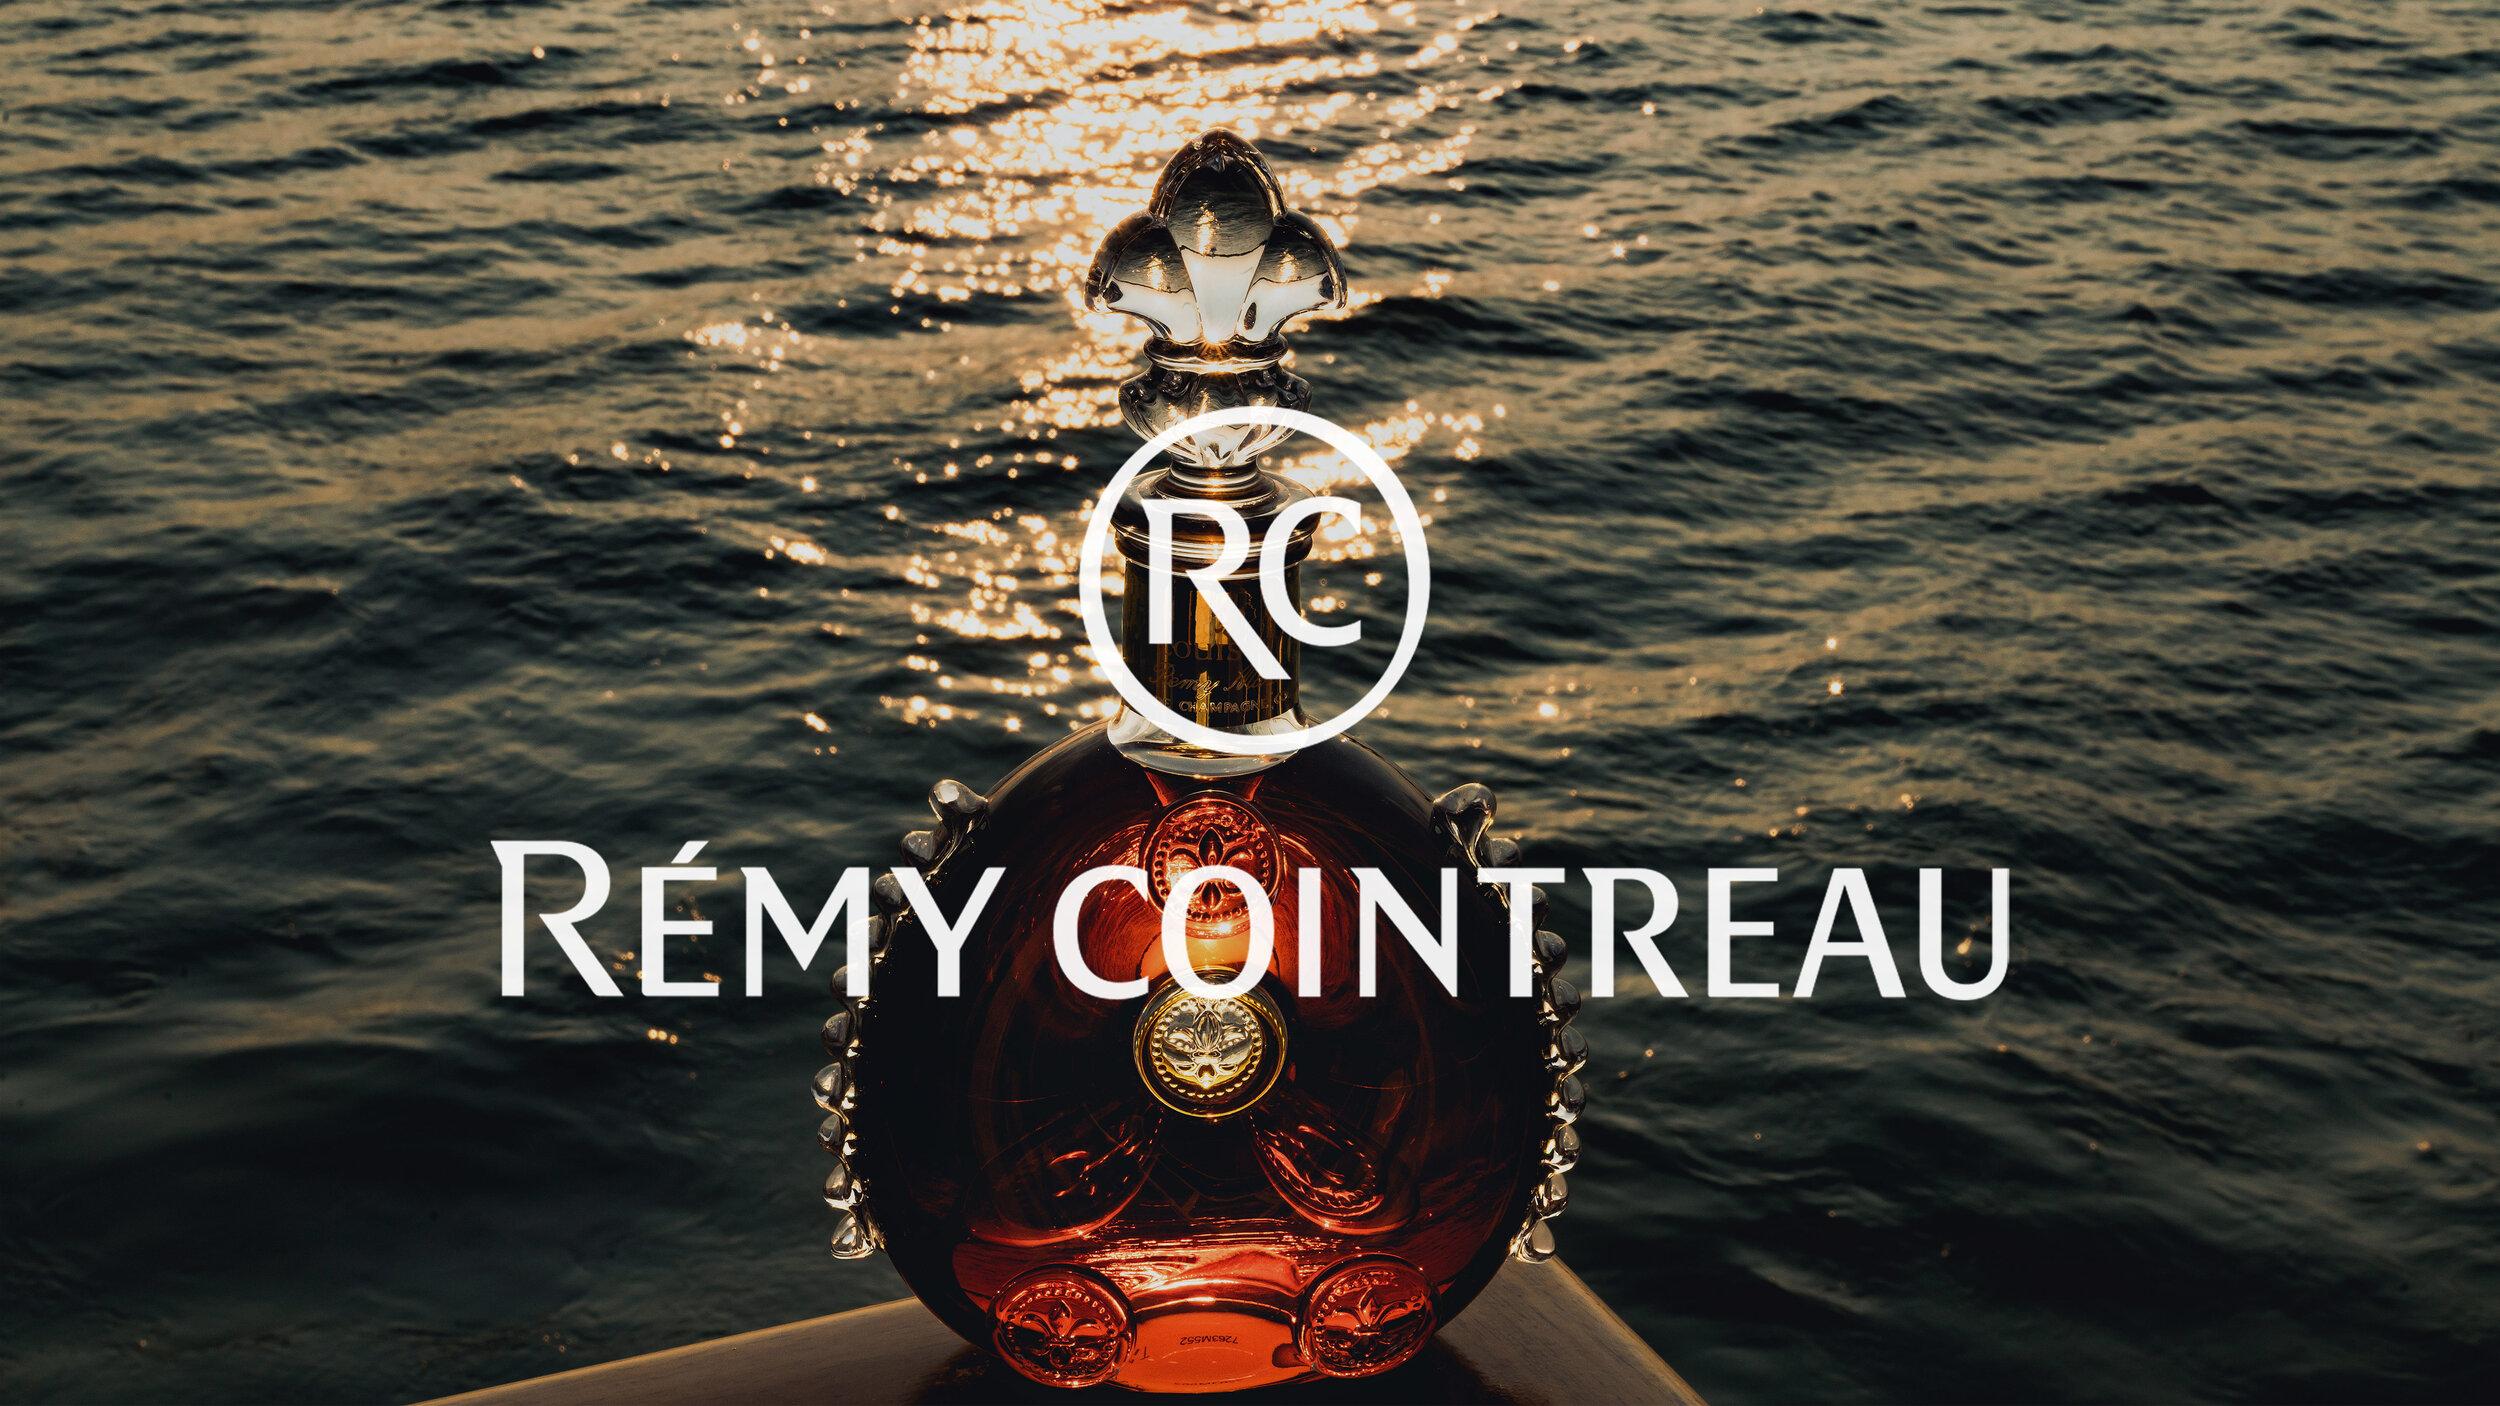 Remy Cointreau Updated.jpg